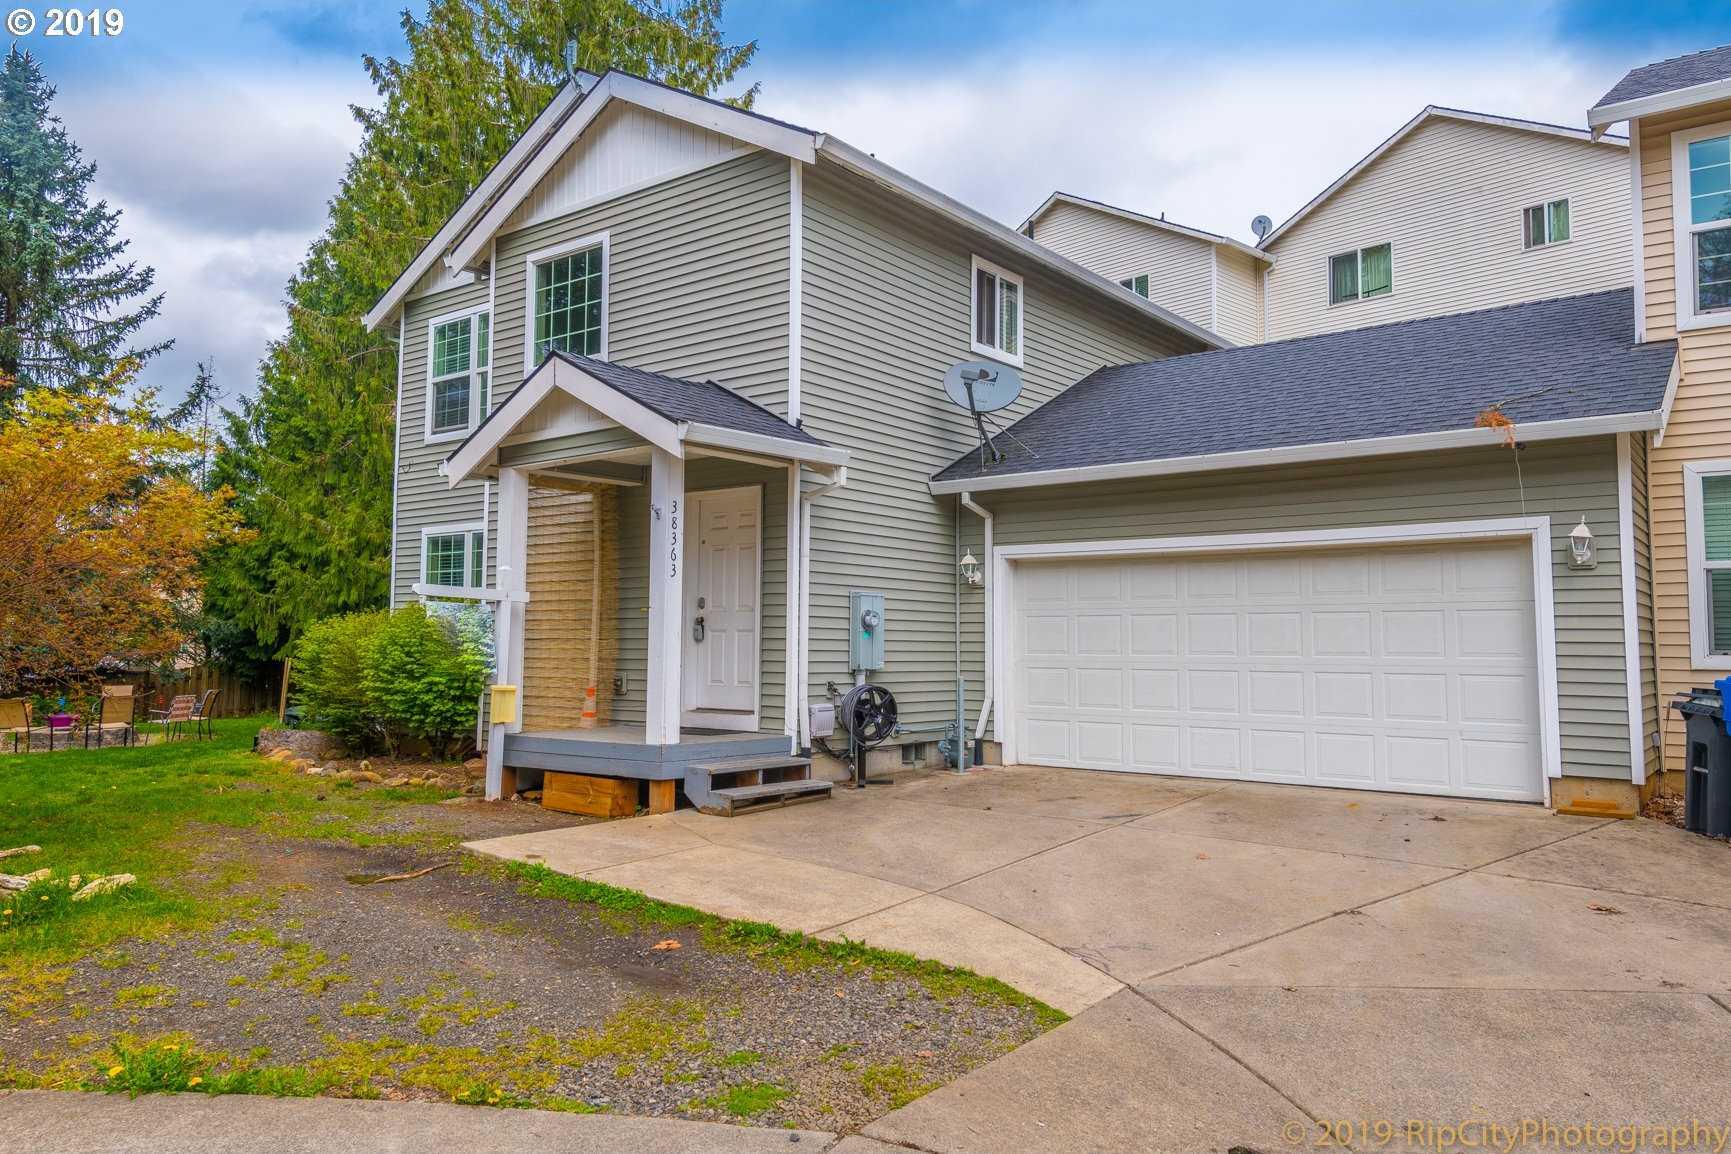 $299,950 - 3Br/3Ba -  for Sale in Barlow Ridge, Sandy